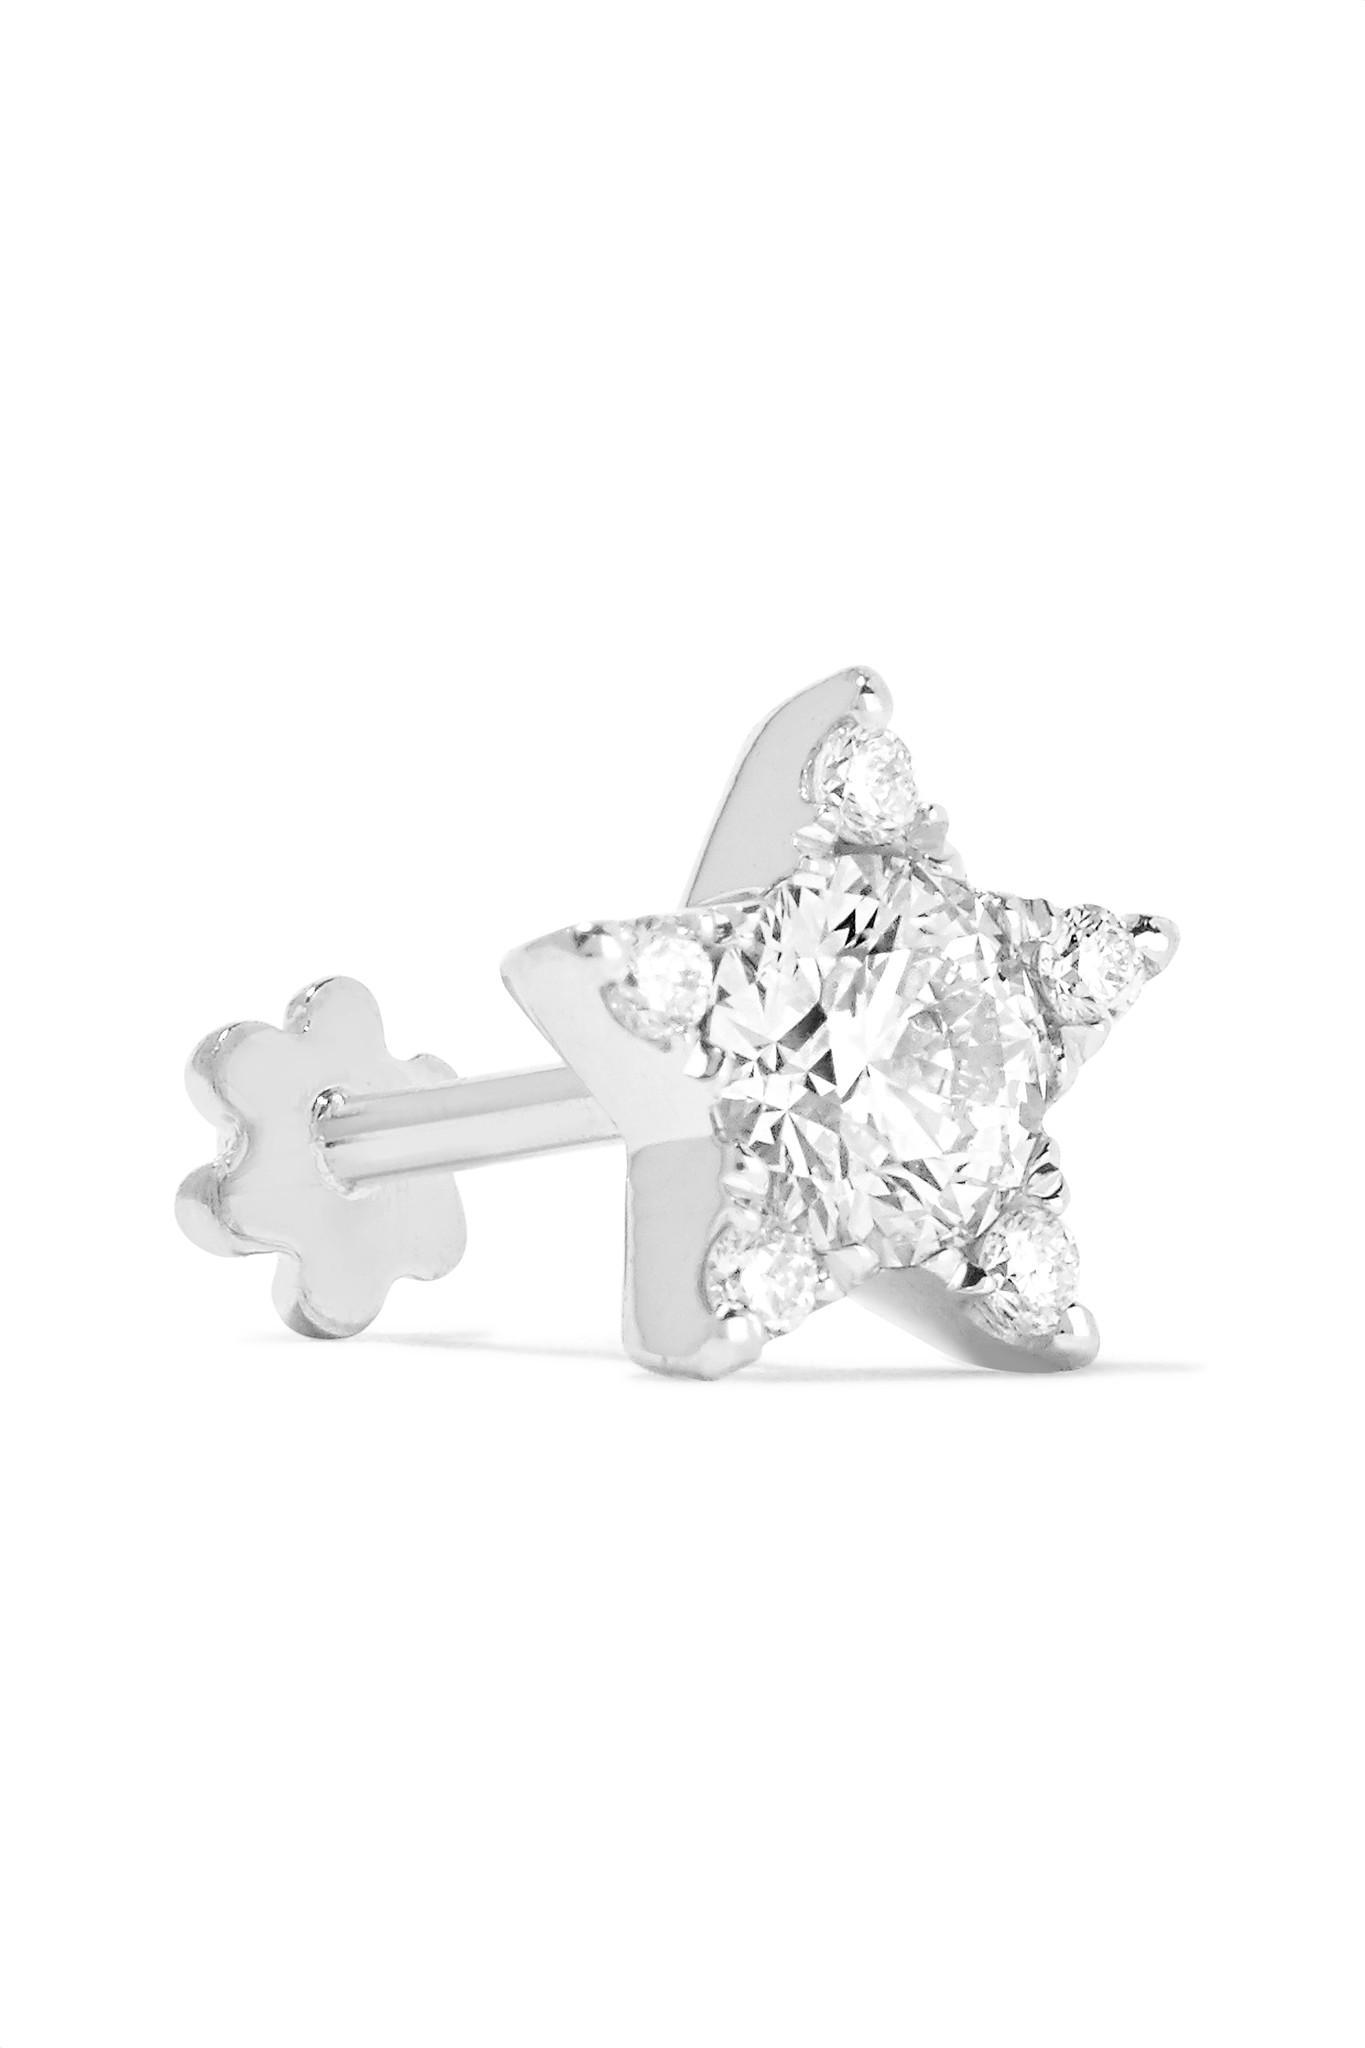 lyst maria tash 18 karat white gold diamond earring in white Gold Diamond Earrings view fullscreen